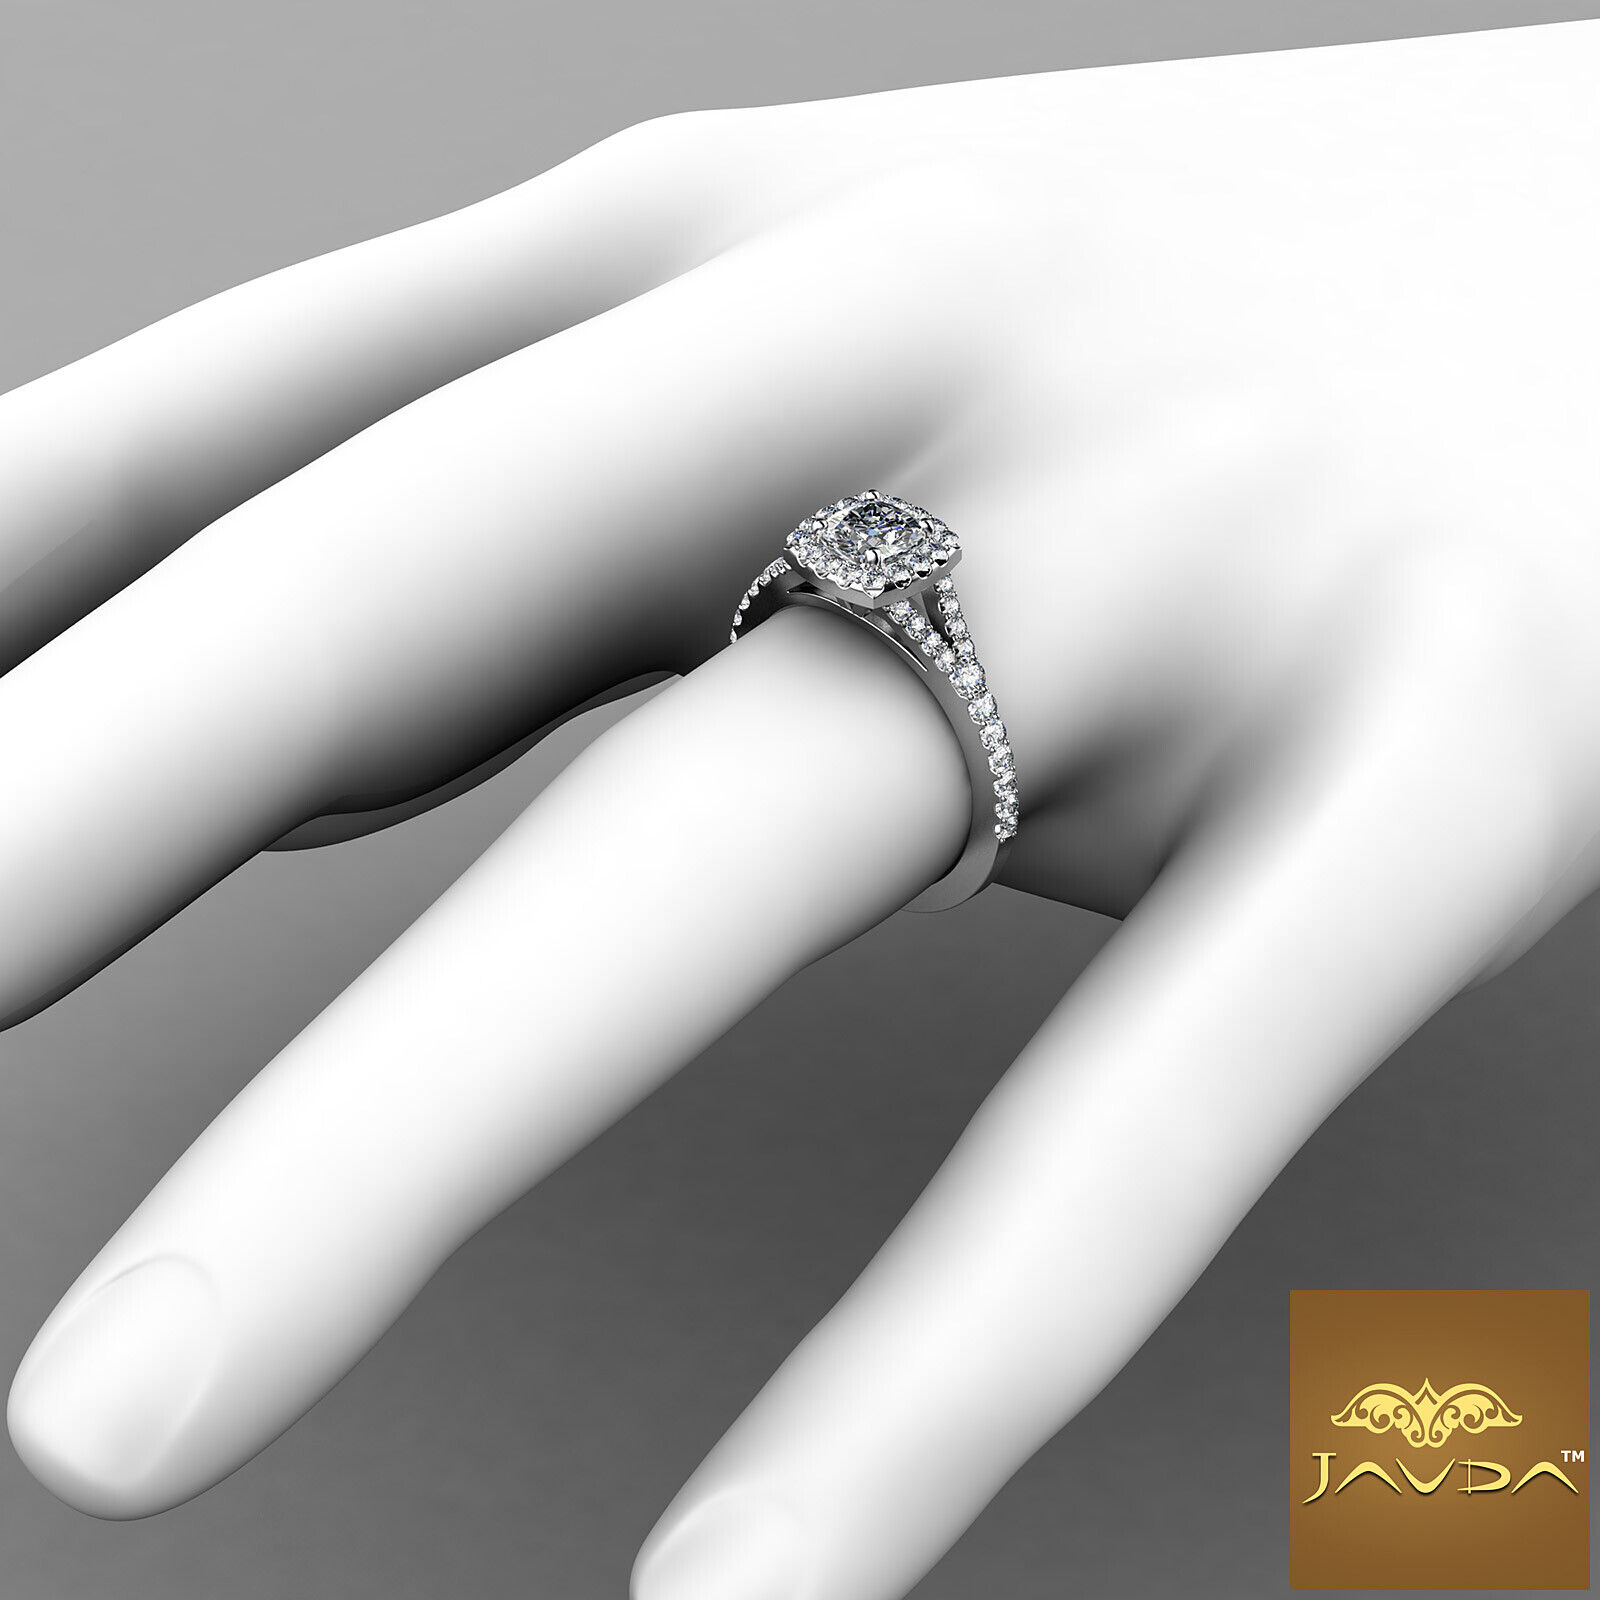 Cushion Shape Diamond Engagement GIA G VVS2 Halo Pre-Set Ring 18k White Gold 1Ct 3